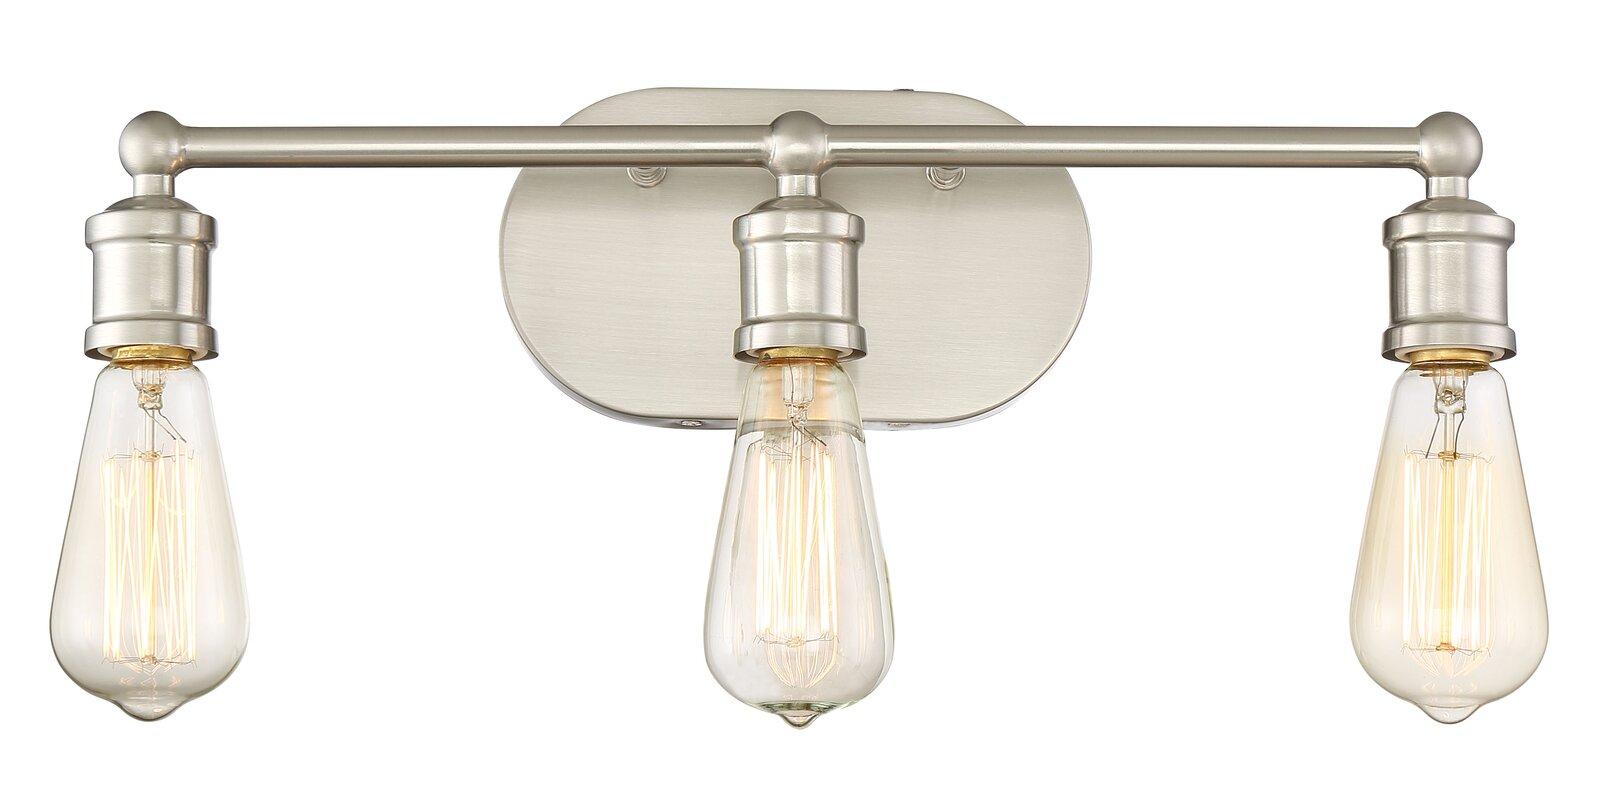 Laurel Foundry Modern Farmhouse Agave 3-Light Vanity Light